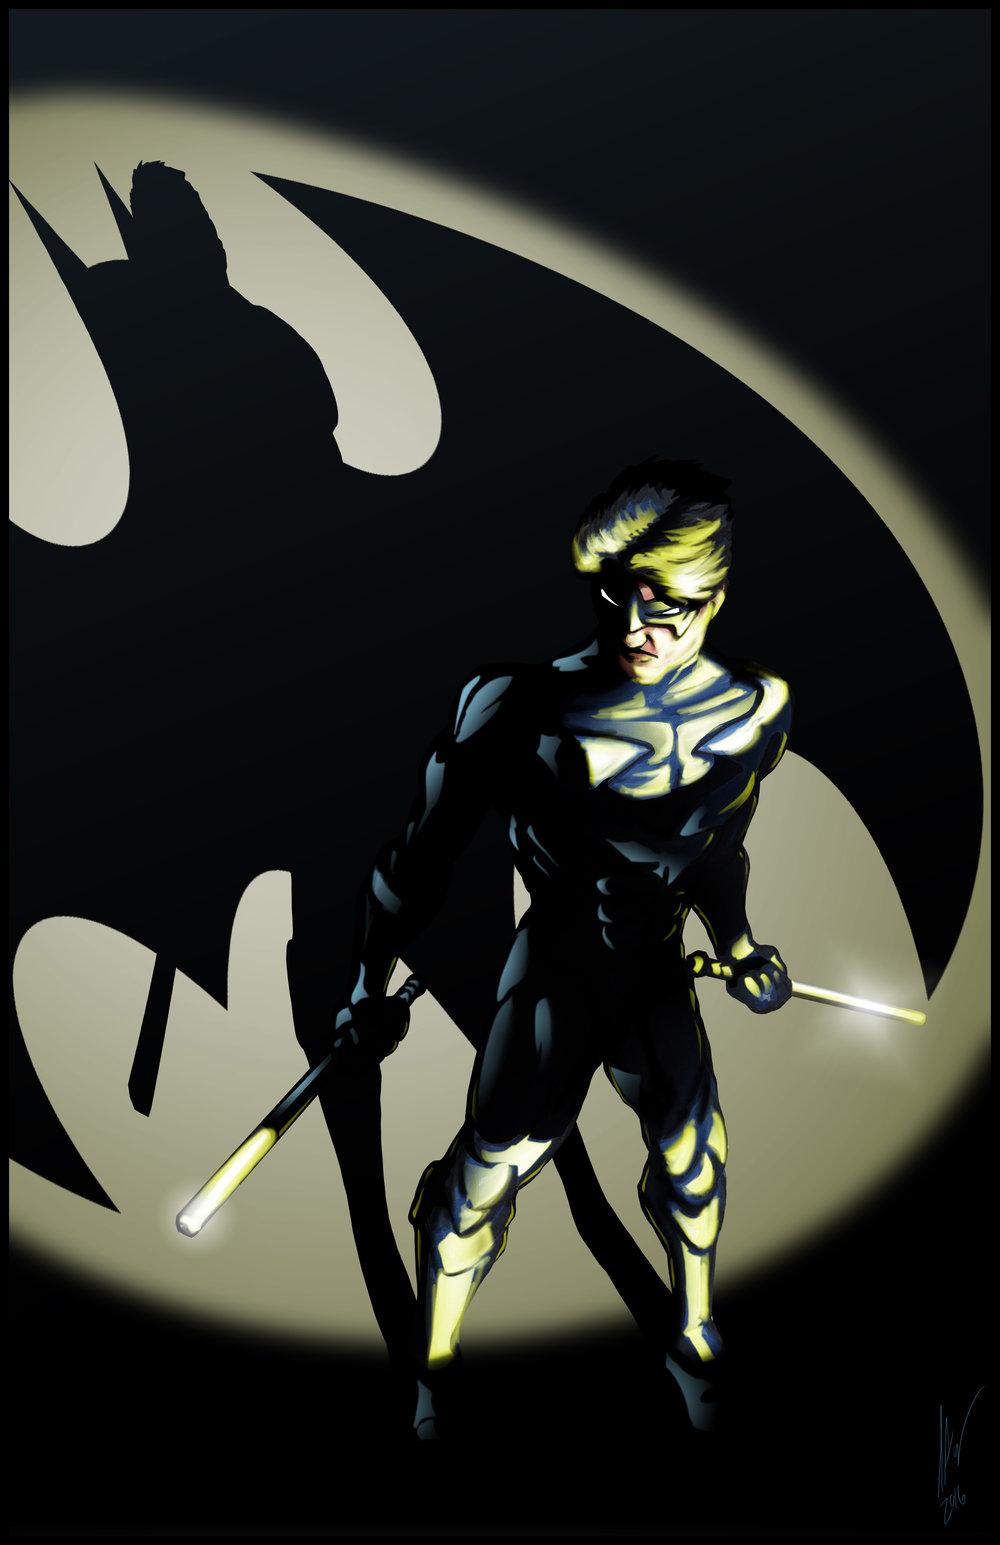 Nightwing - Shadow of the Bat 11x17.jpg